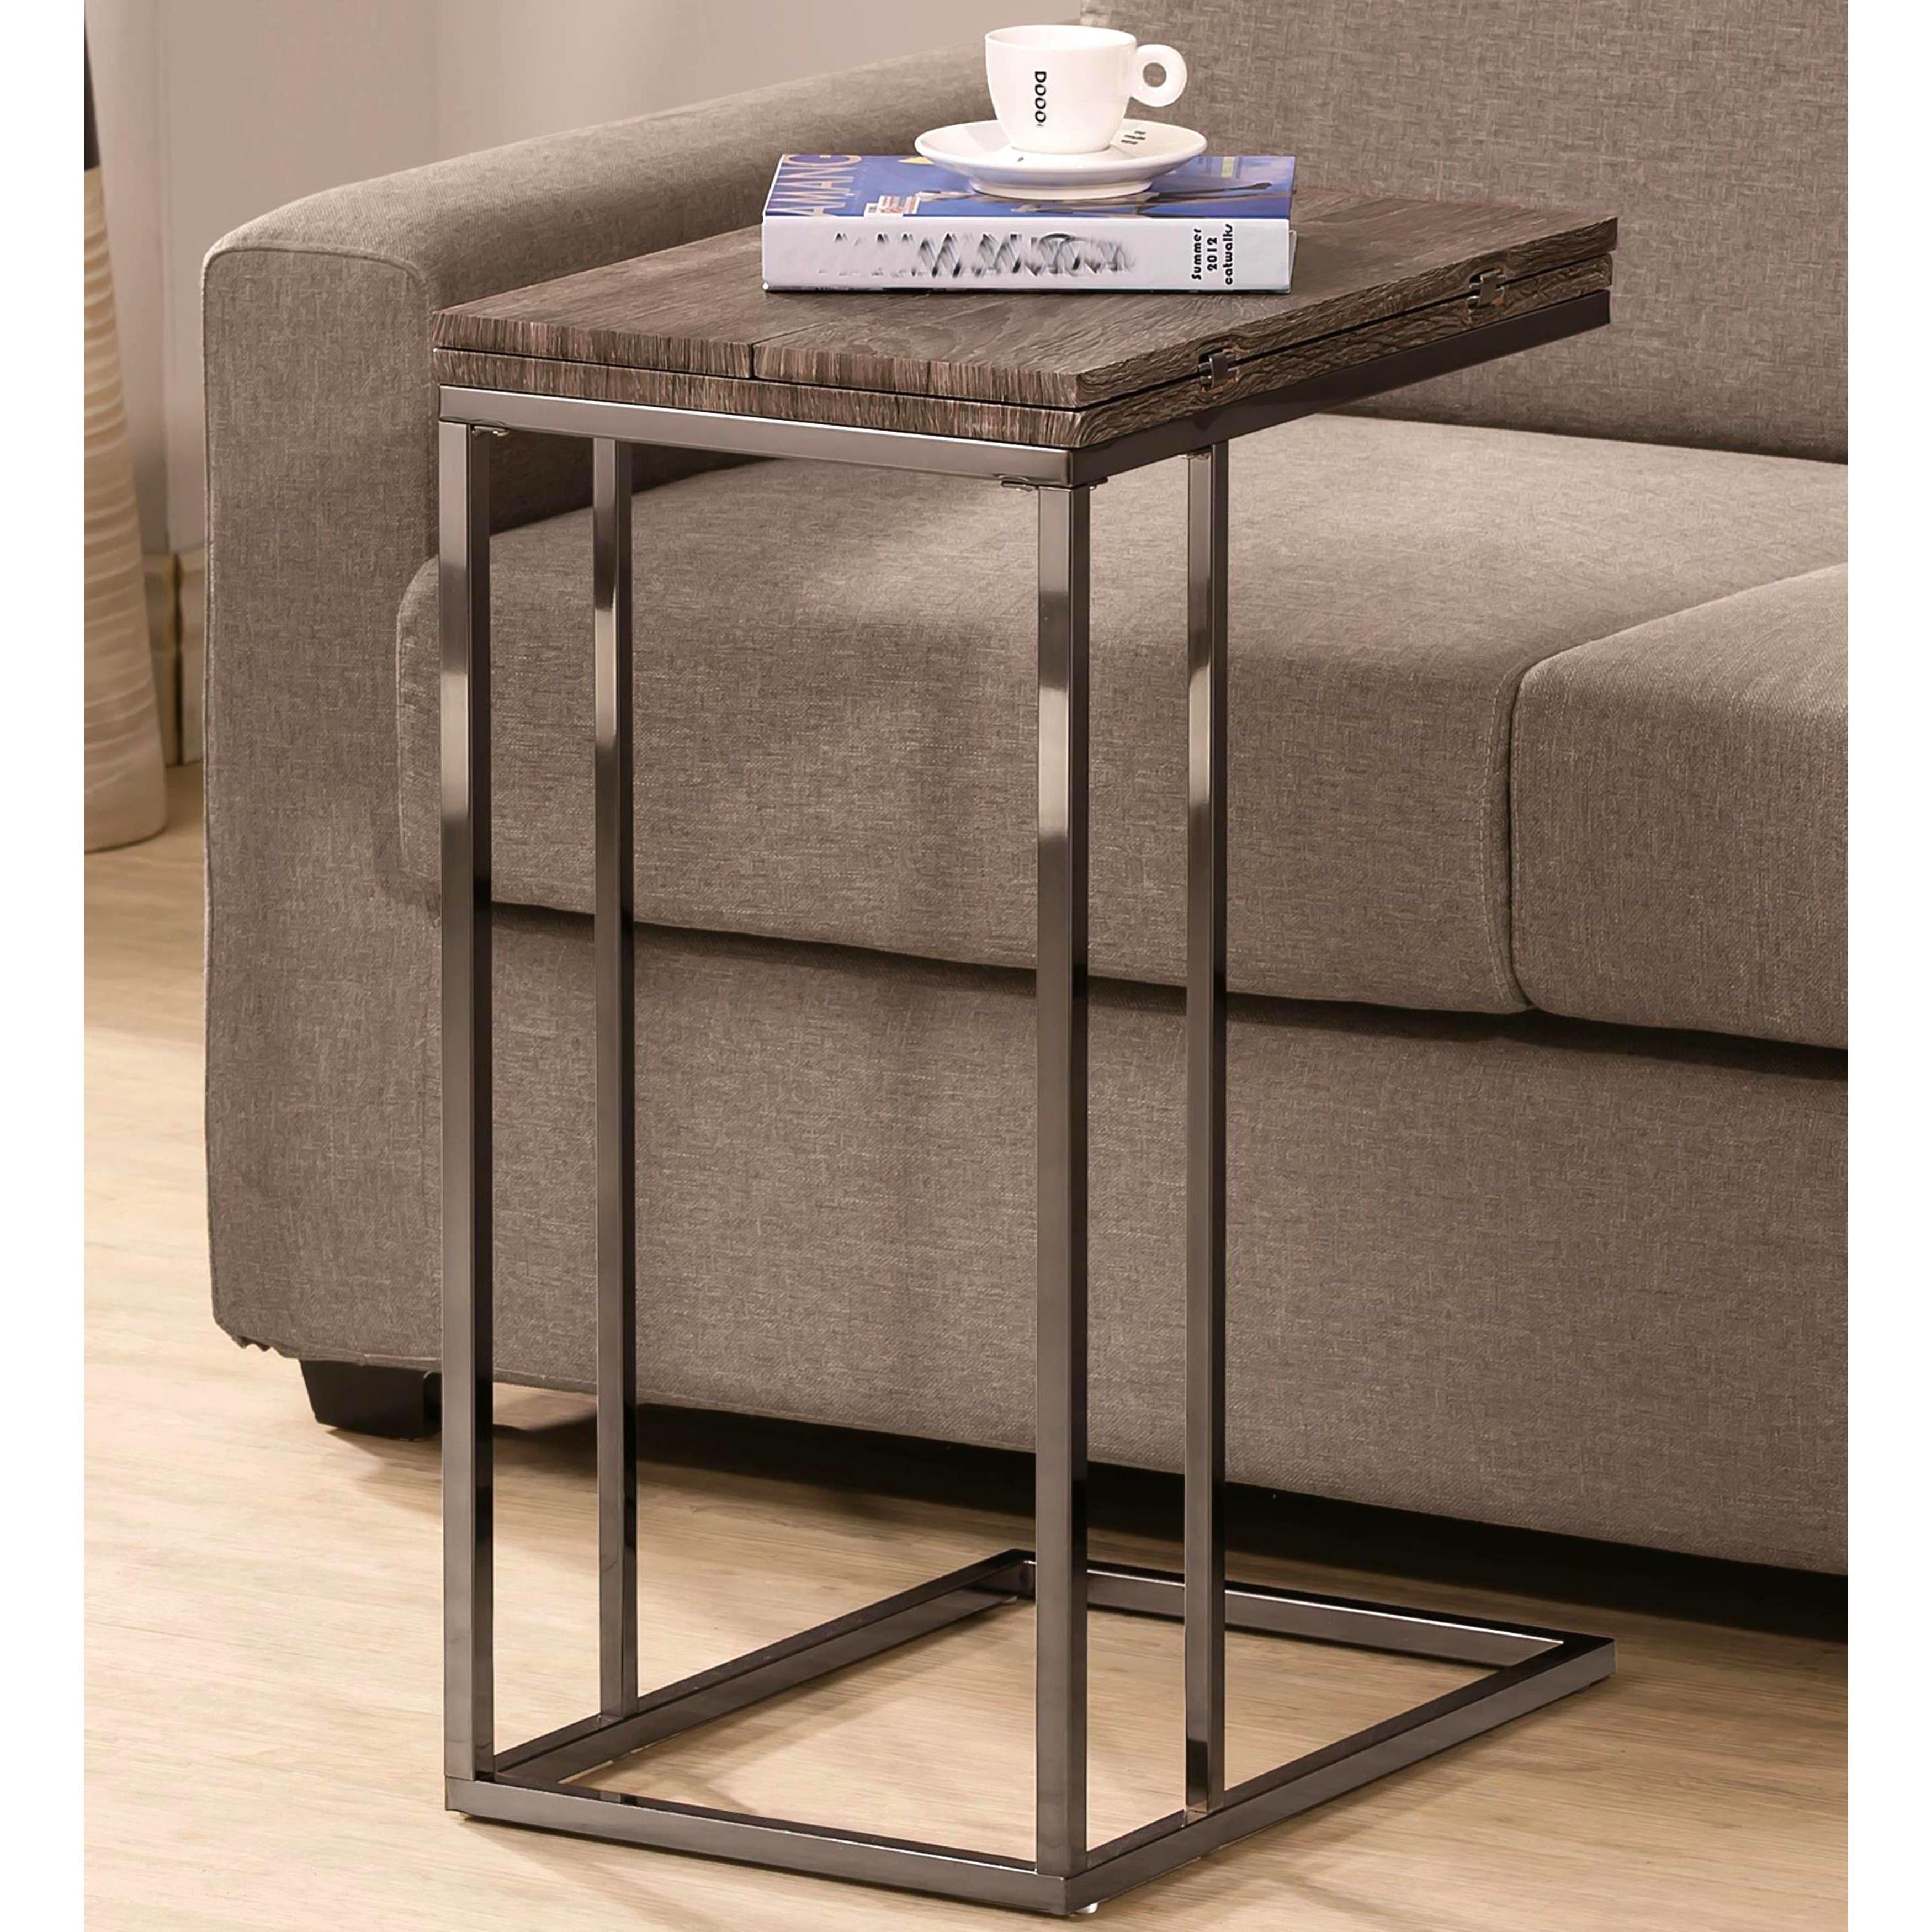 Overstock Com Online Shopping Bedding Furniture Electronics Jewelry Clothing More Mesa De Sofa Moveis Decoracao Design De Moveis